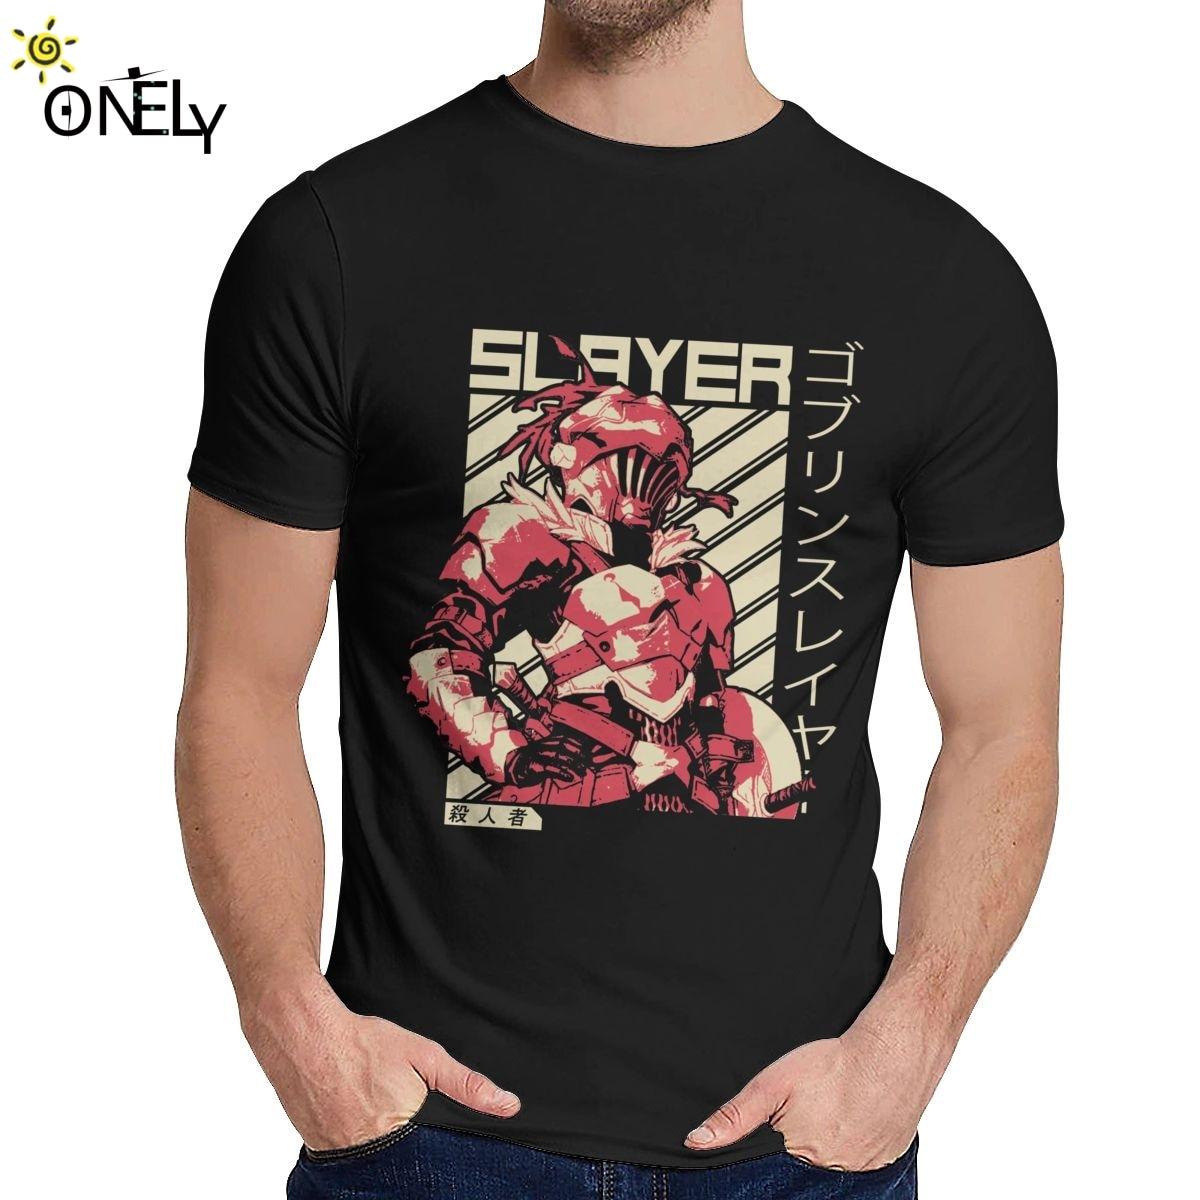 Goblin slaye anime t camisa crewneck elegante retro masculino 100% algodão plus size t camisa